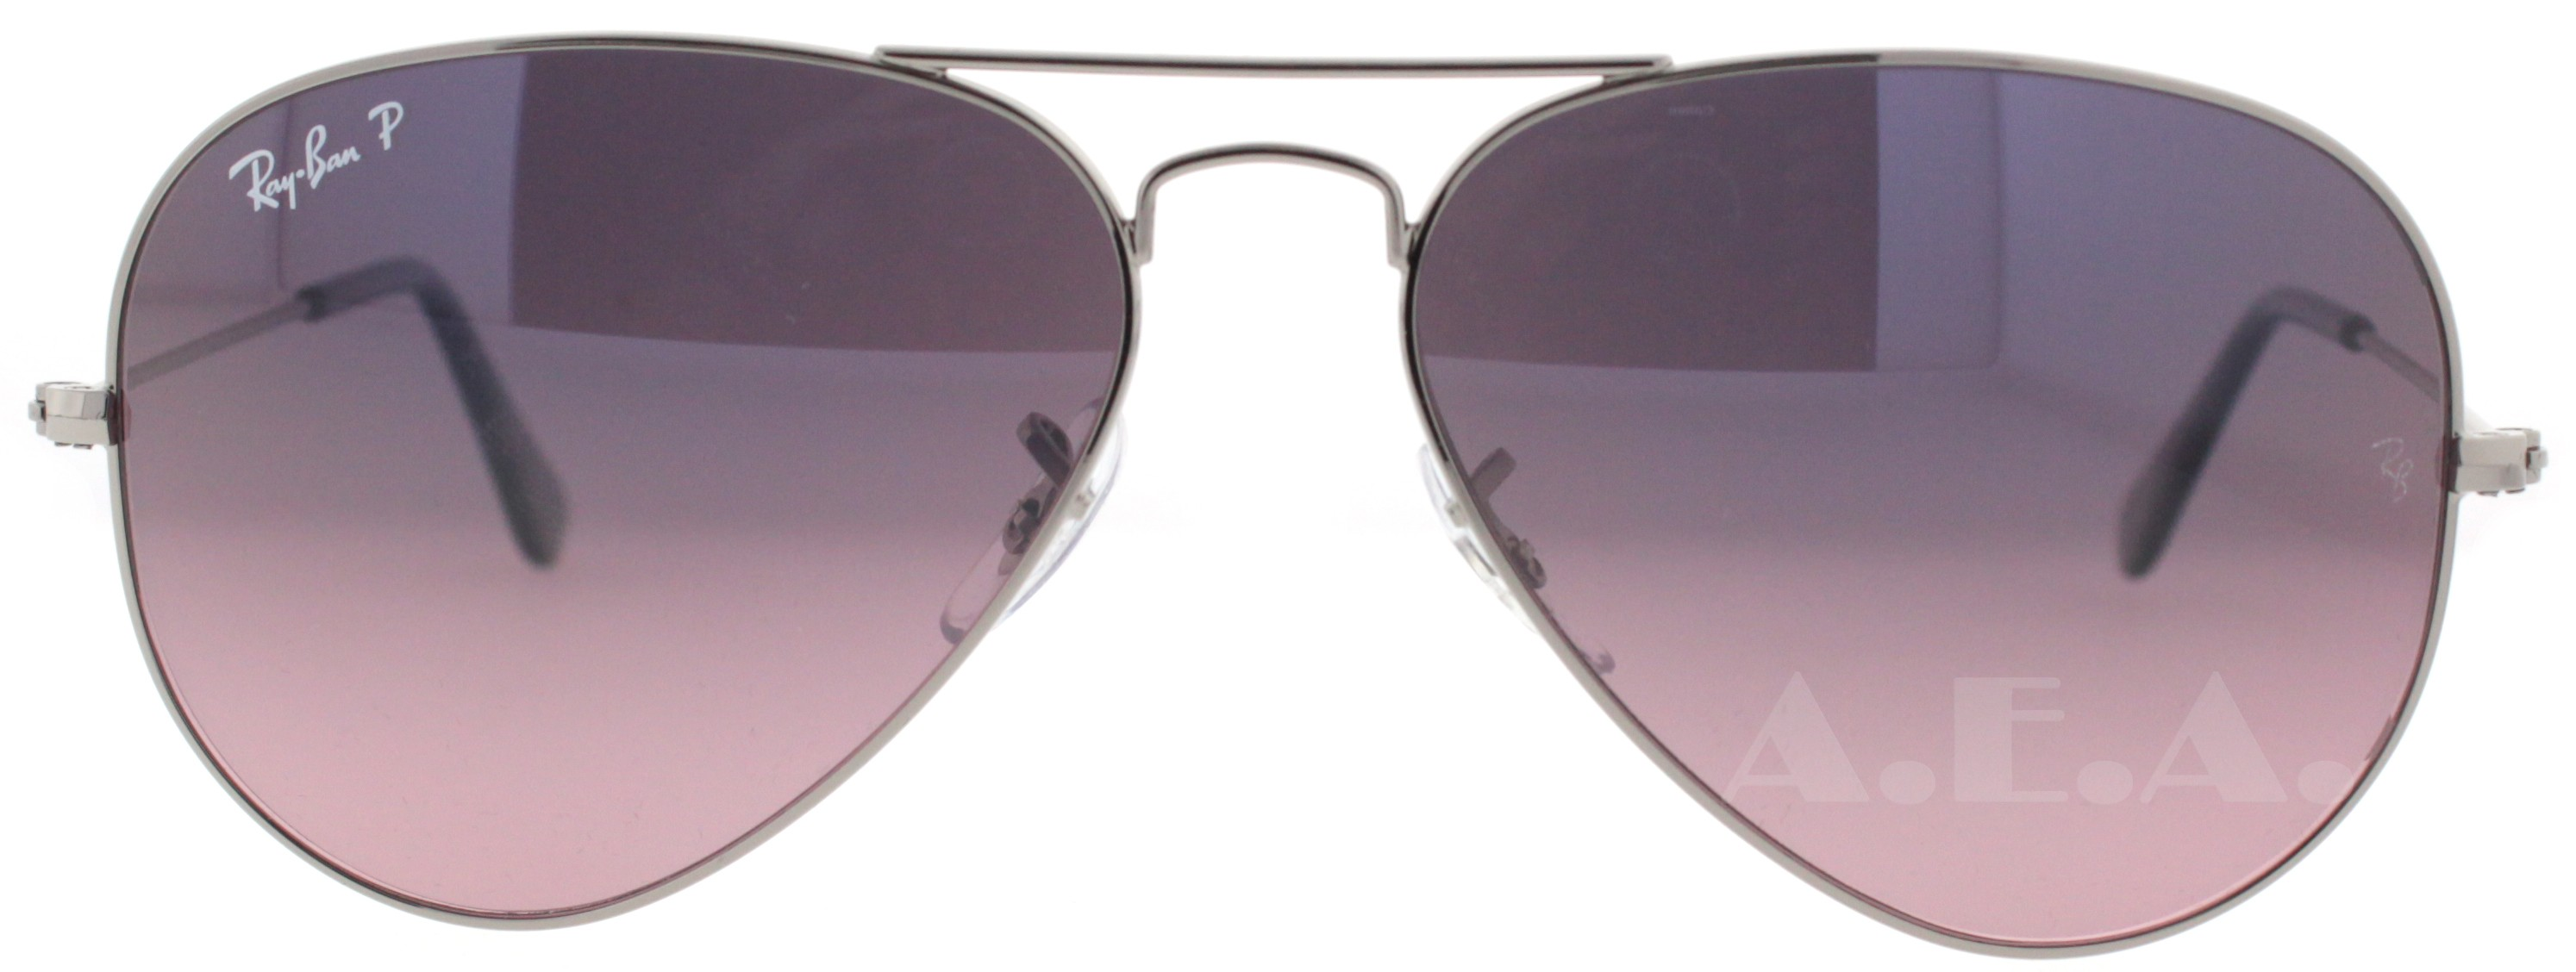 521e08e3460831 Ray Ban Mens Rb 3427 Metal Sunglasses